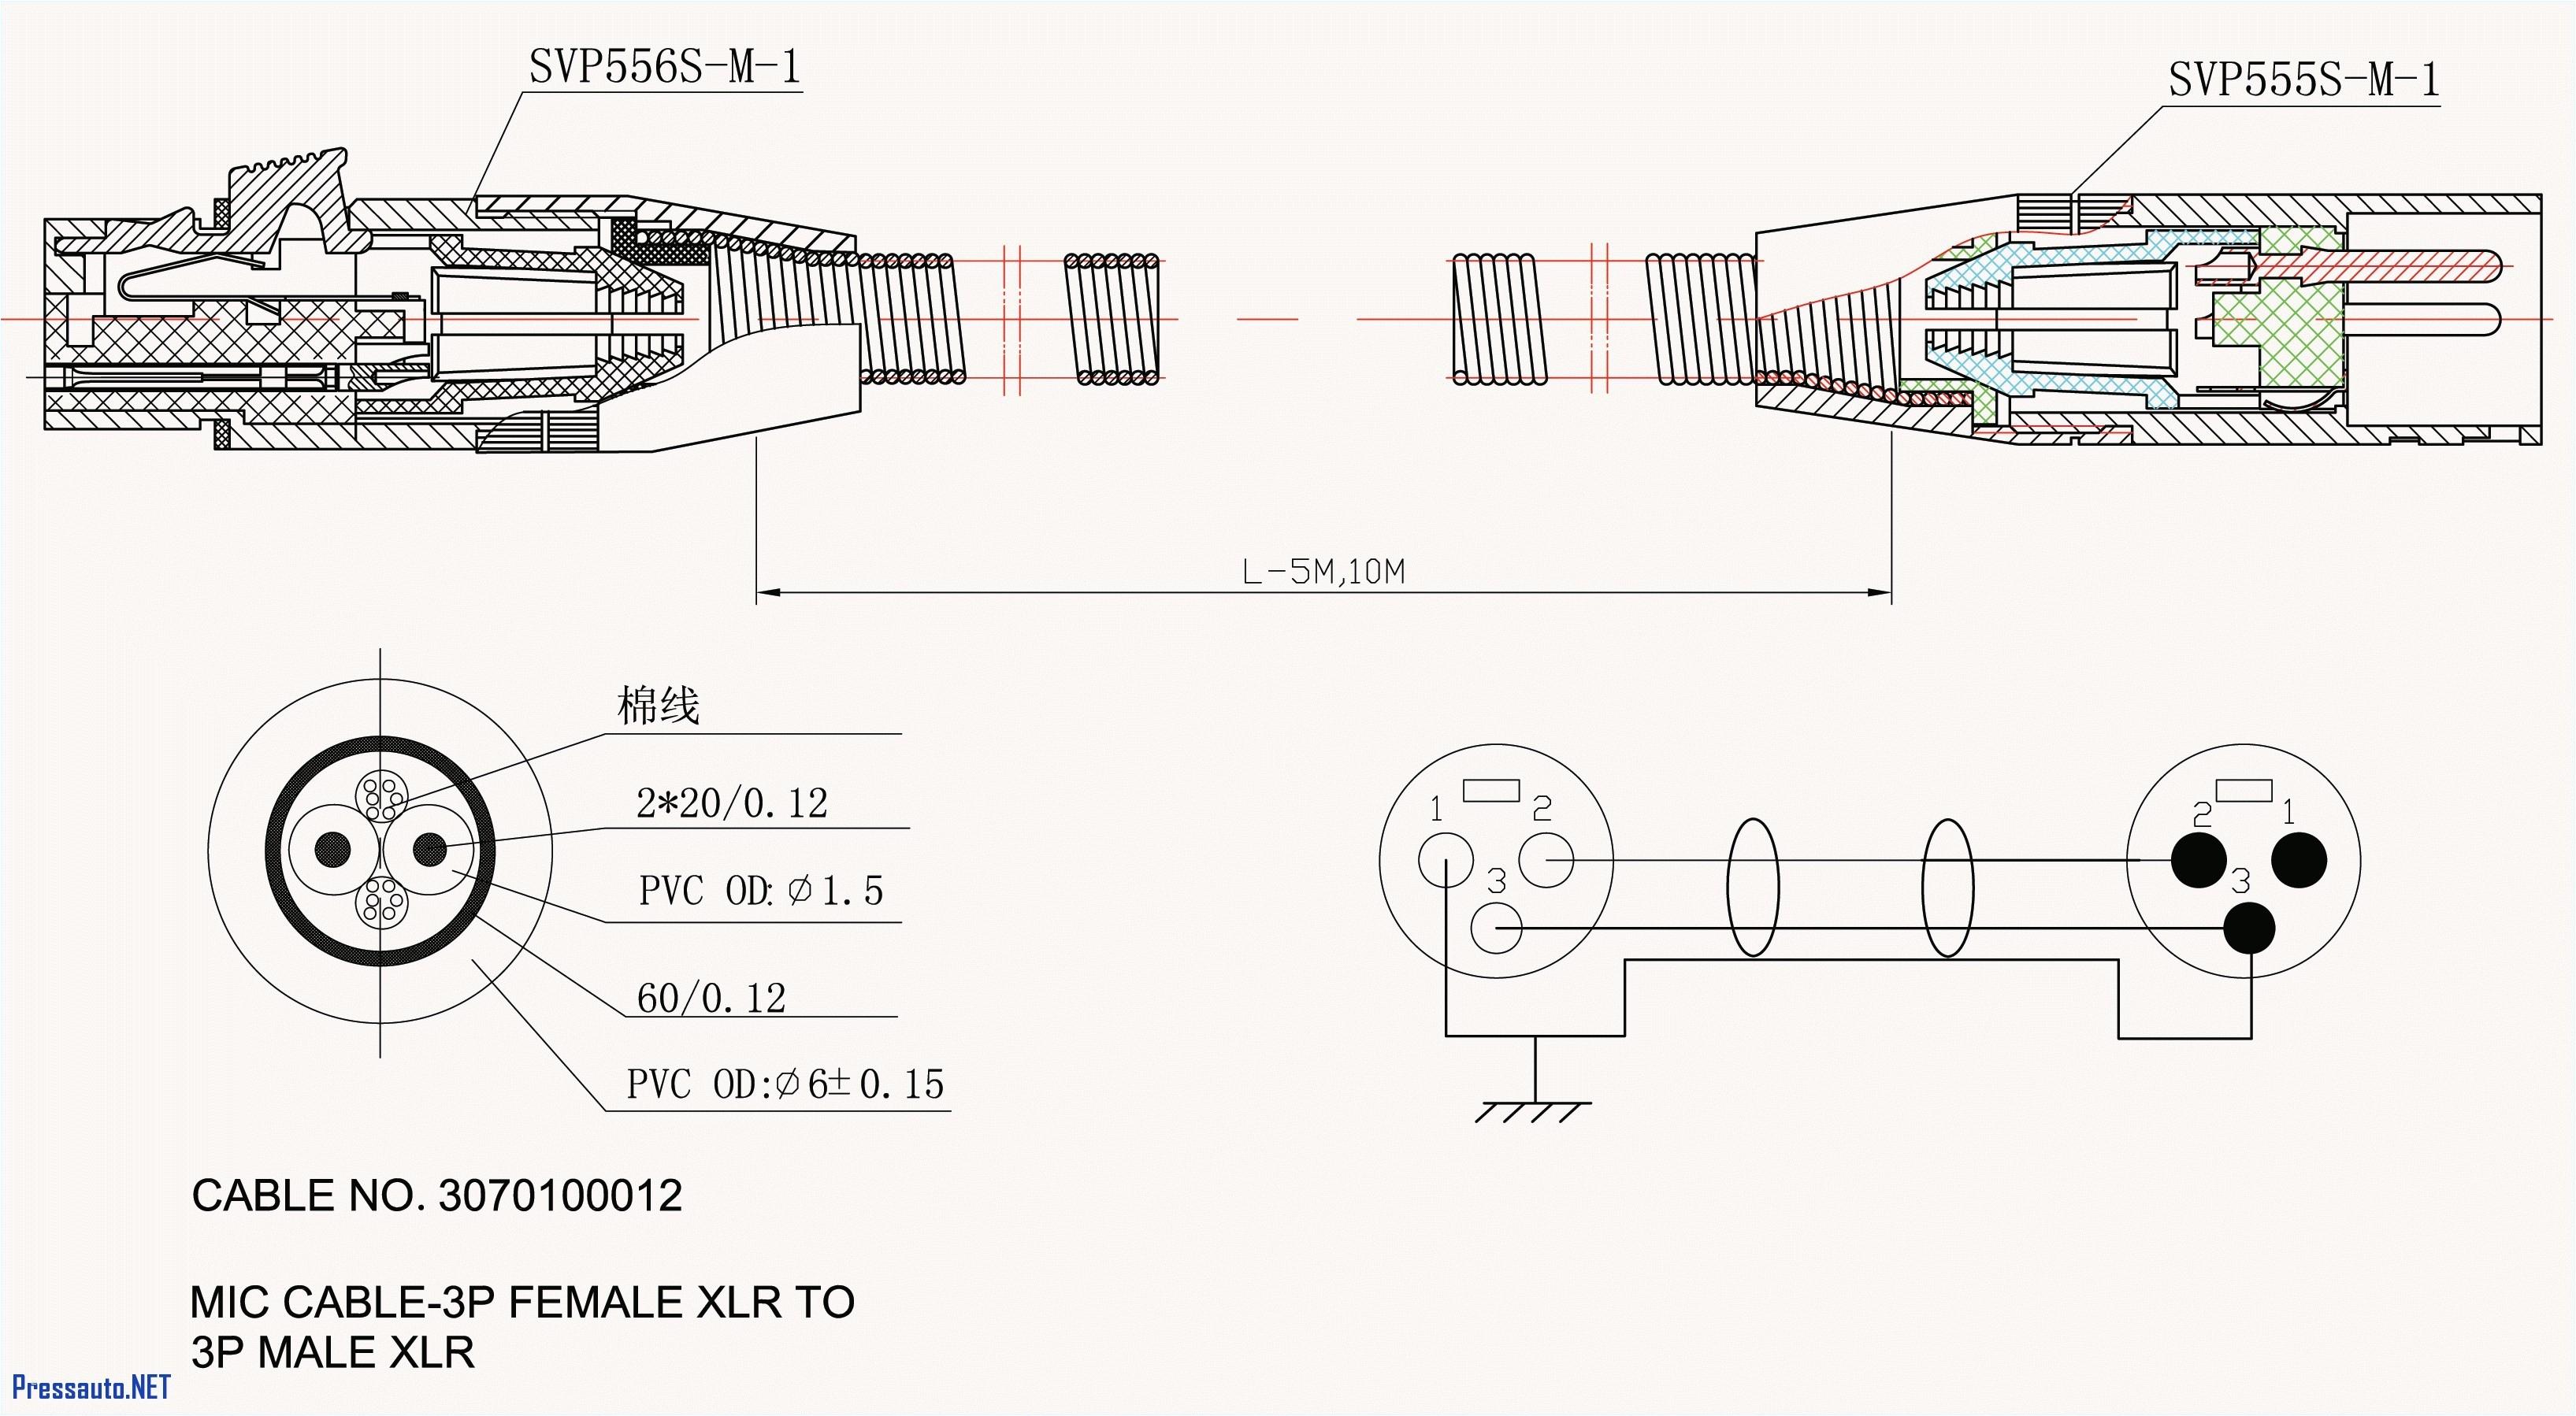 vision spinner 2 wiring diagram wiring xlr spinner wiring diagram for light switch